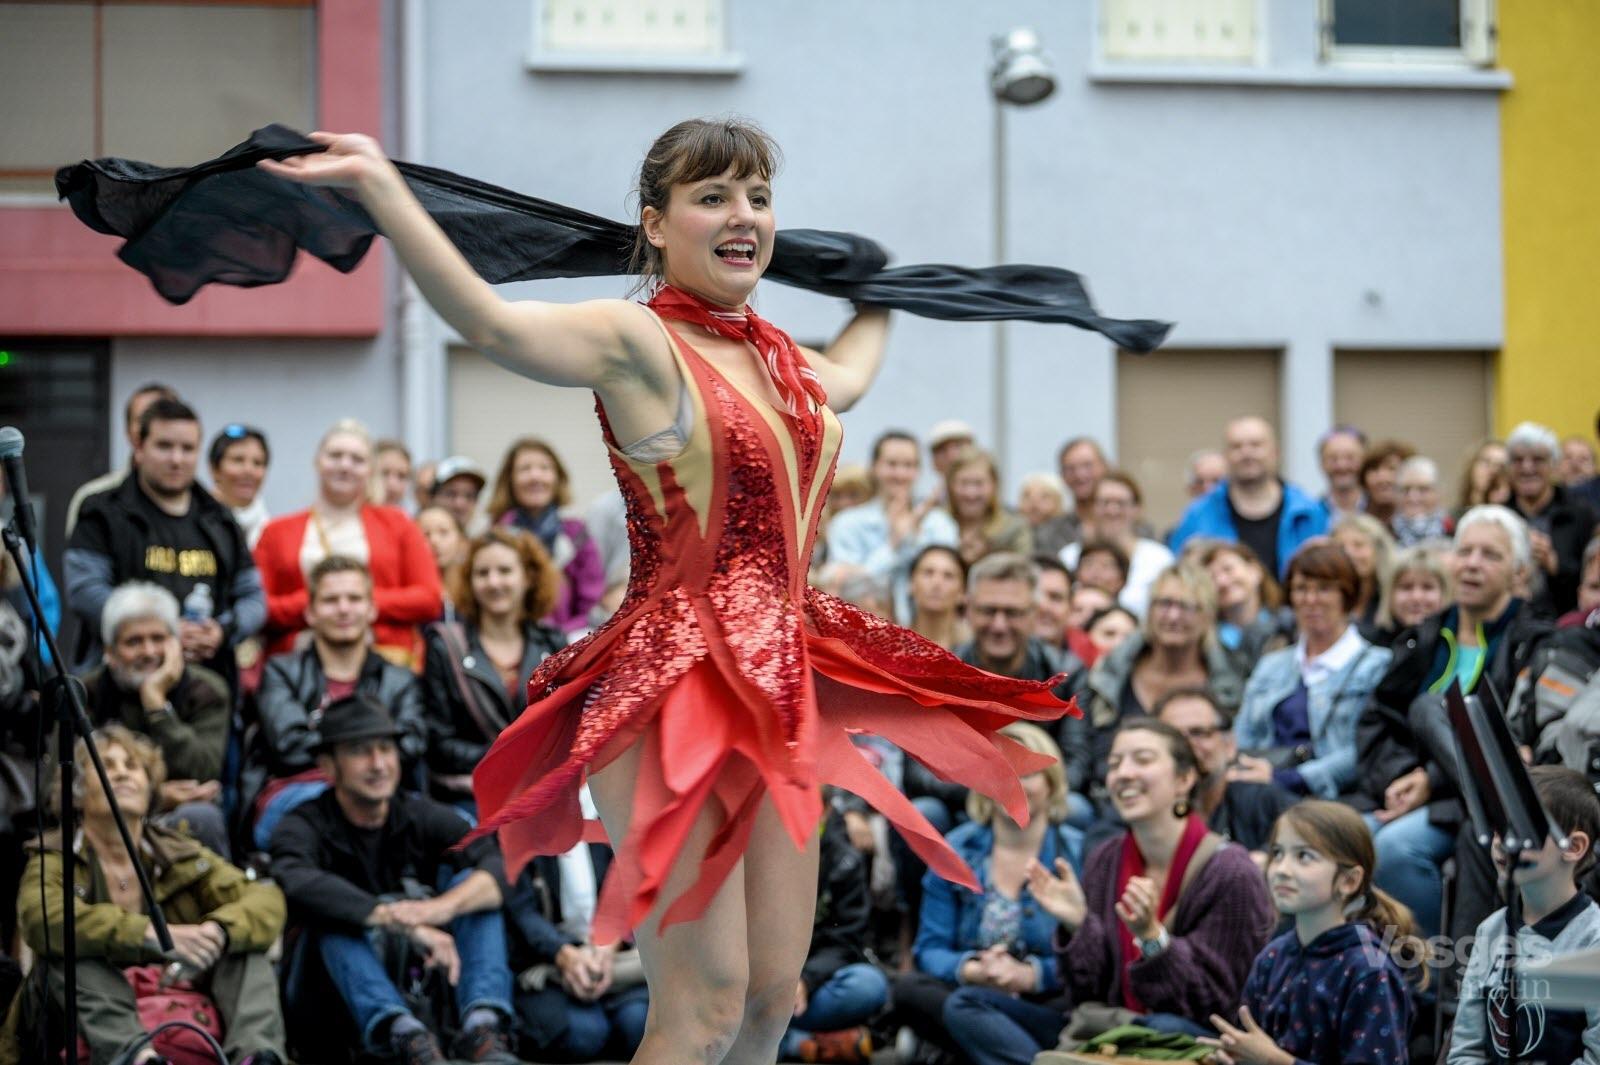 festival-rues-et-cies-t-i-t-r-(thinkin-in-the-rain)-de-fanny-duret-vosges-matin-jerome-humbrecht-1560541958 2.jpg